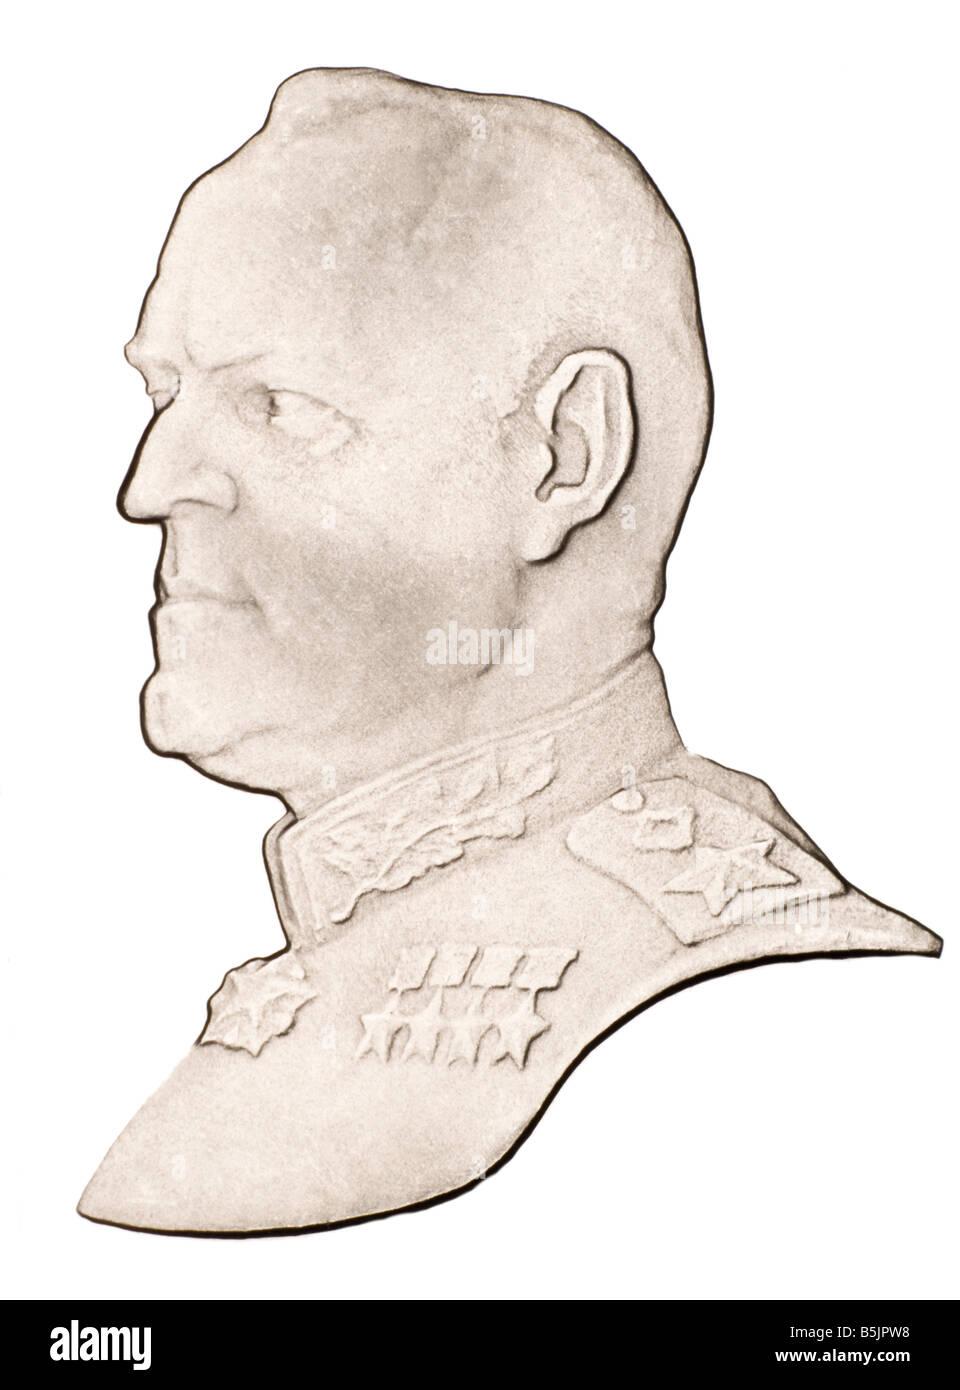 Profile Portrait of Russian Marshall Georgi Konstantinovich Zhukov (1898-1974) from Russian coin of 1990 - Stock Image